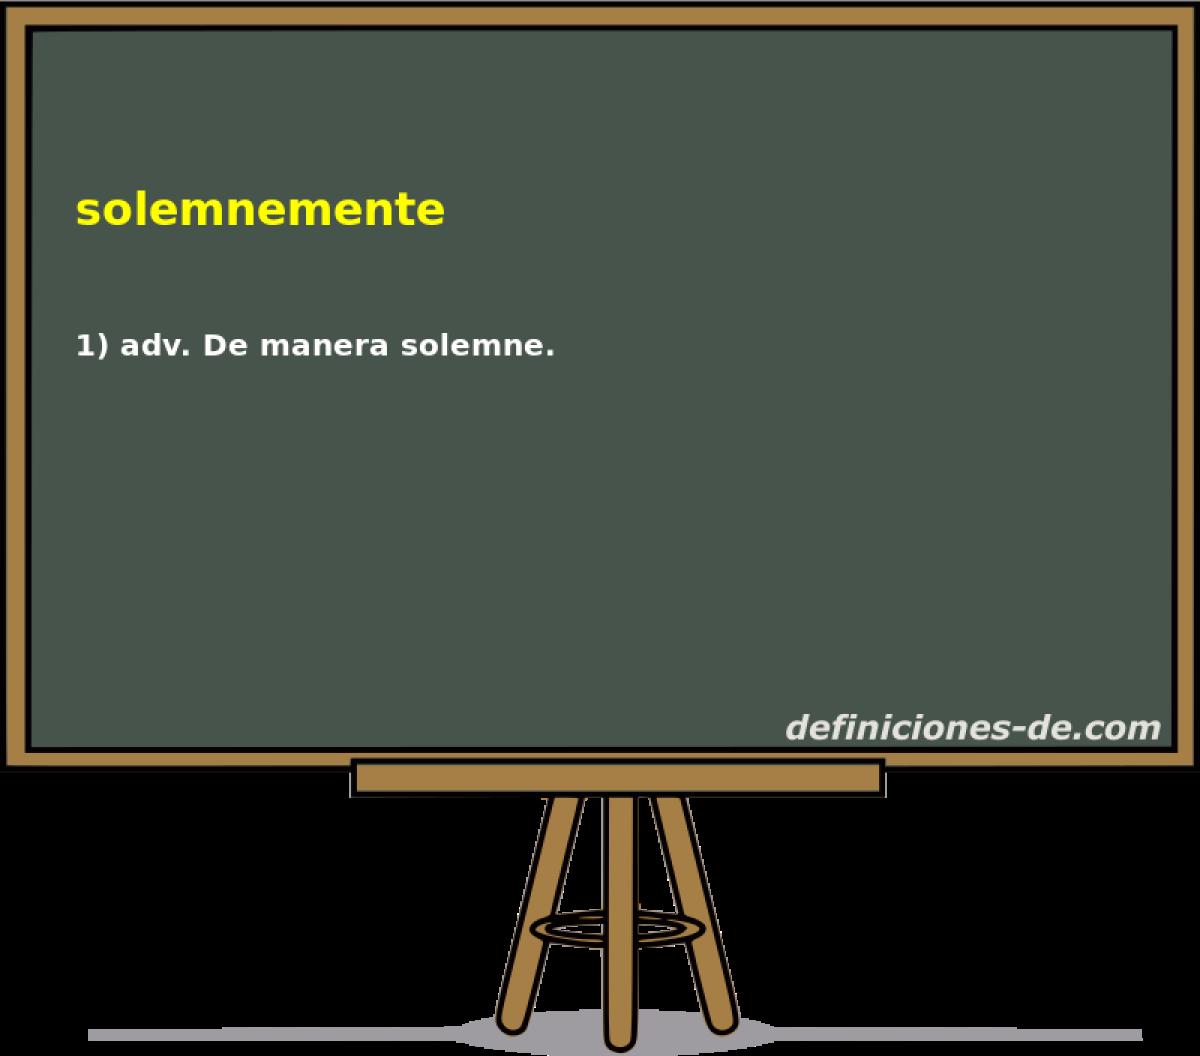 Sinónimo de solemne